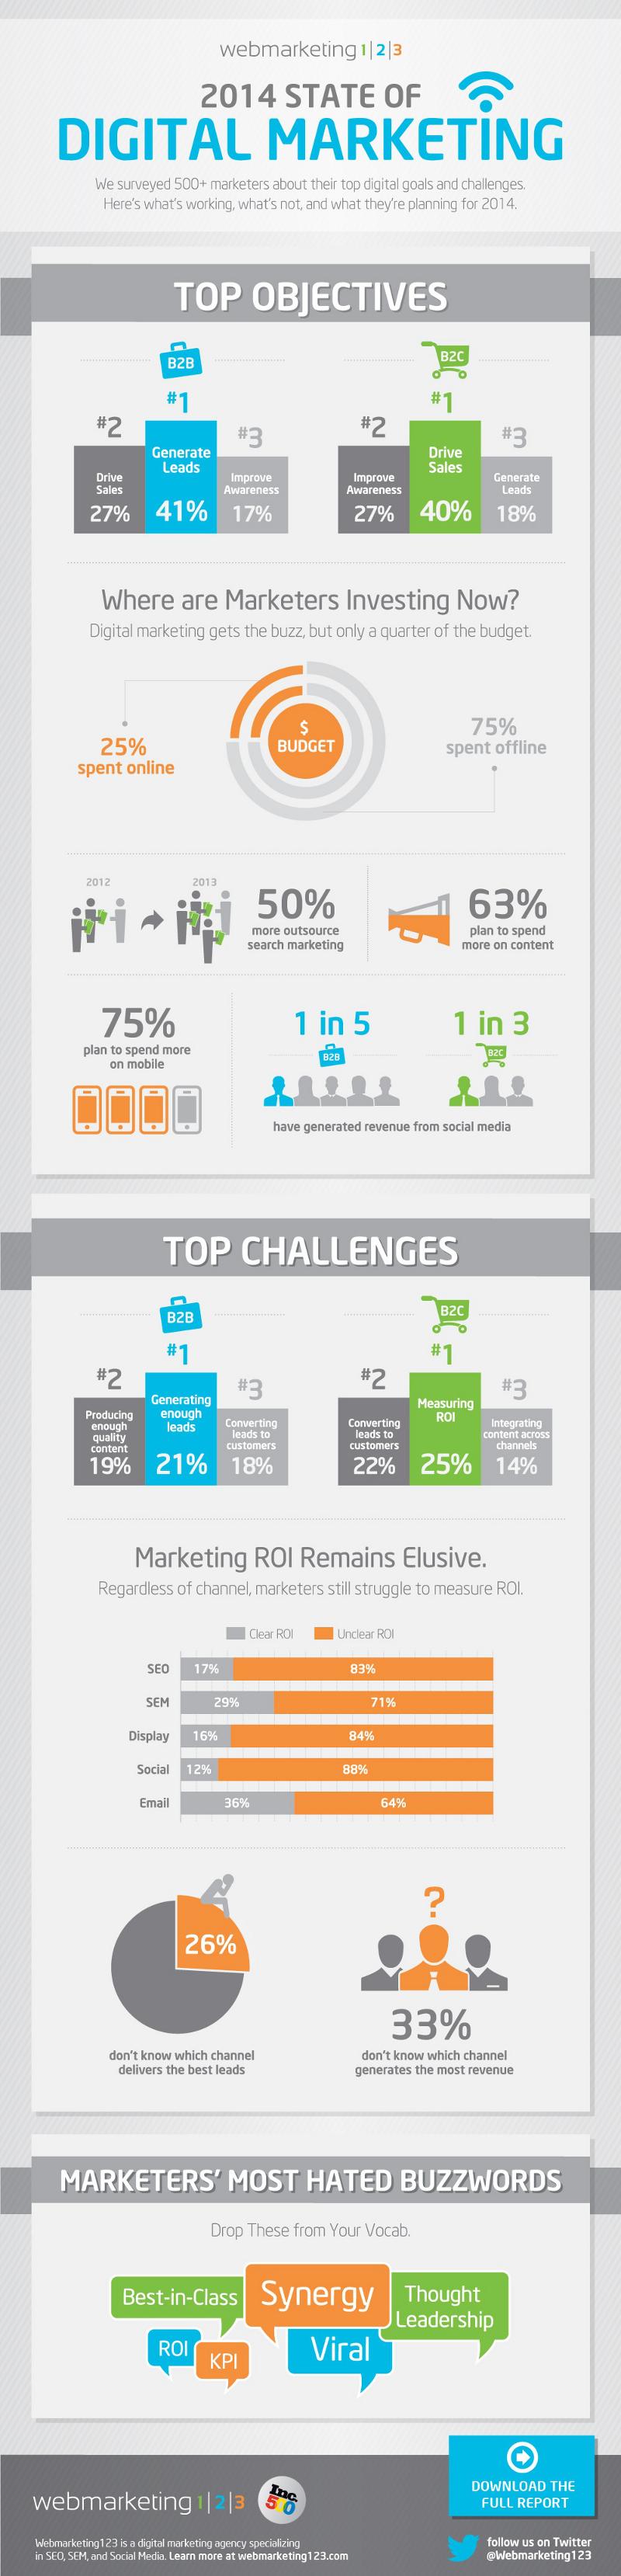 Digital Marketing for B2C Business